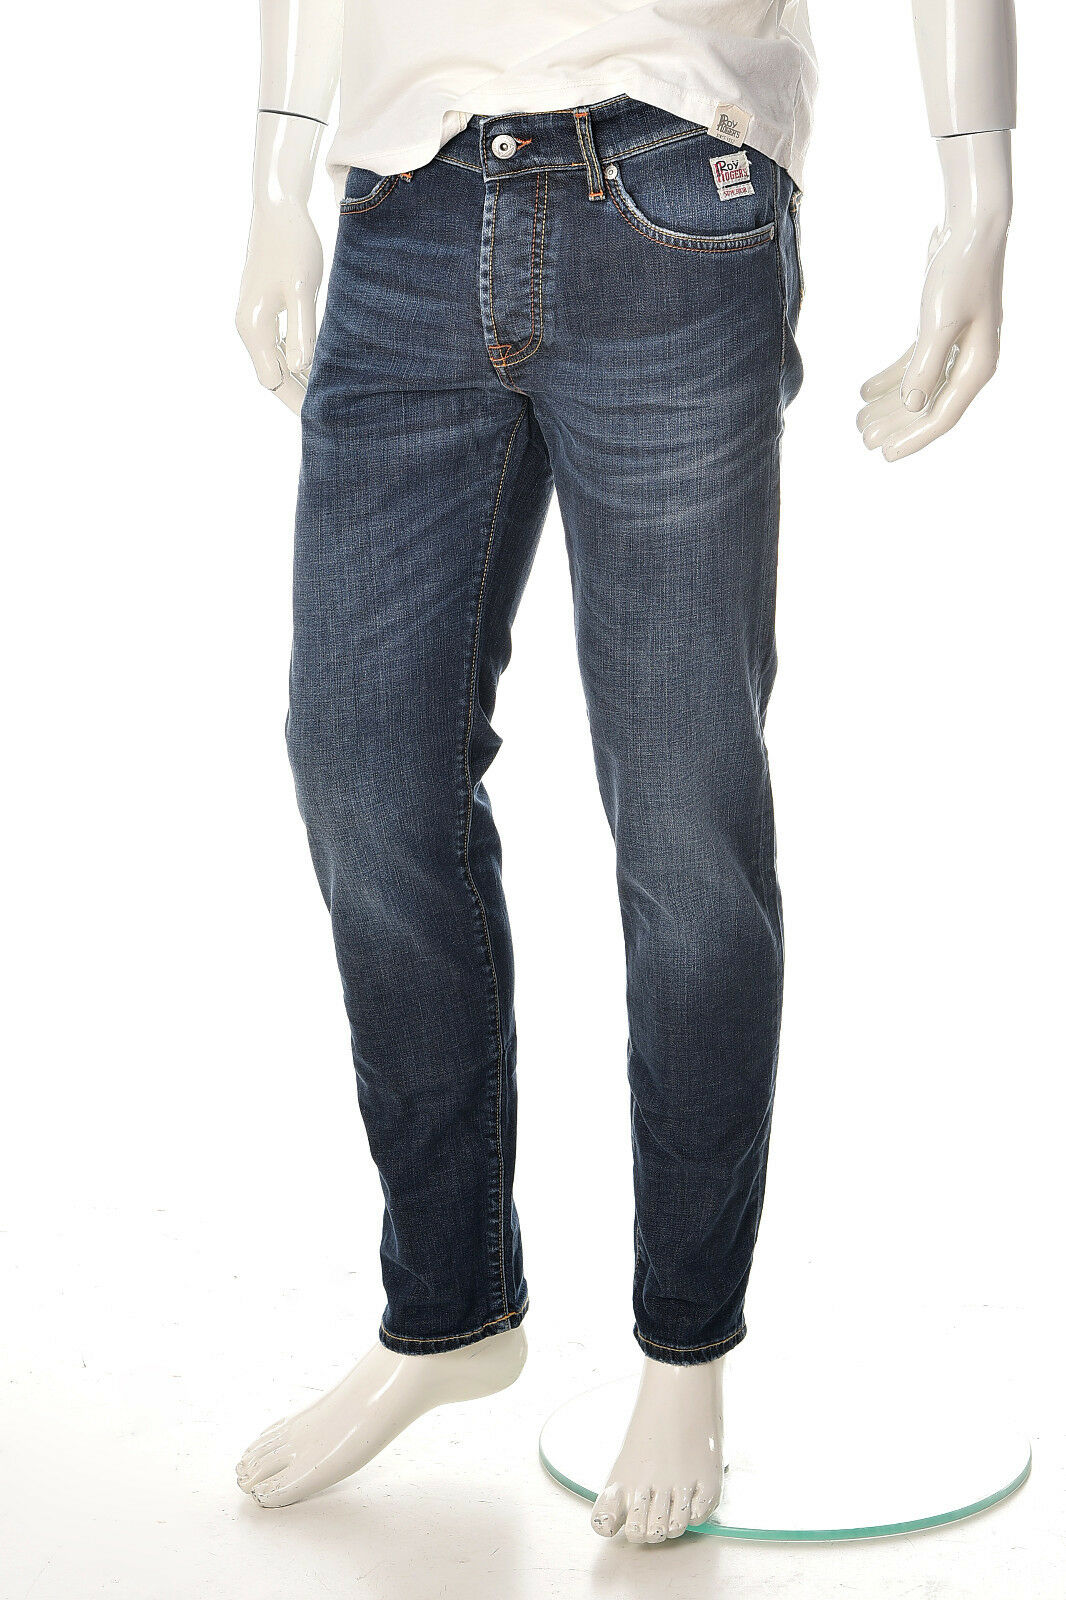 Jeans Uomo ROY ROGER'S 529 Cut Superior Paulo Cotone Denim Denim Denim Scuri Stretch NUOVI d9bb36